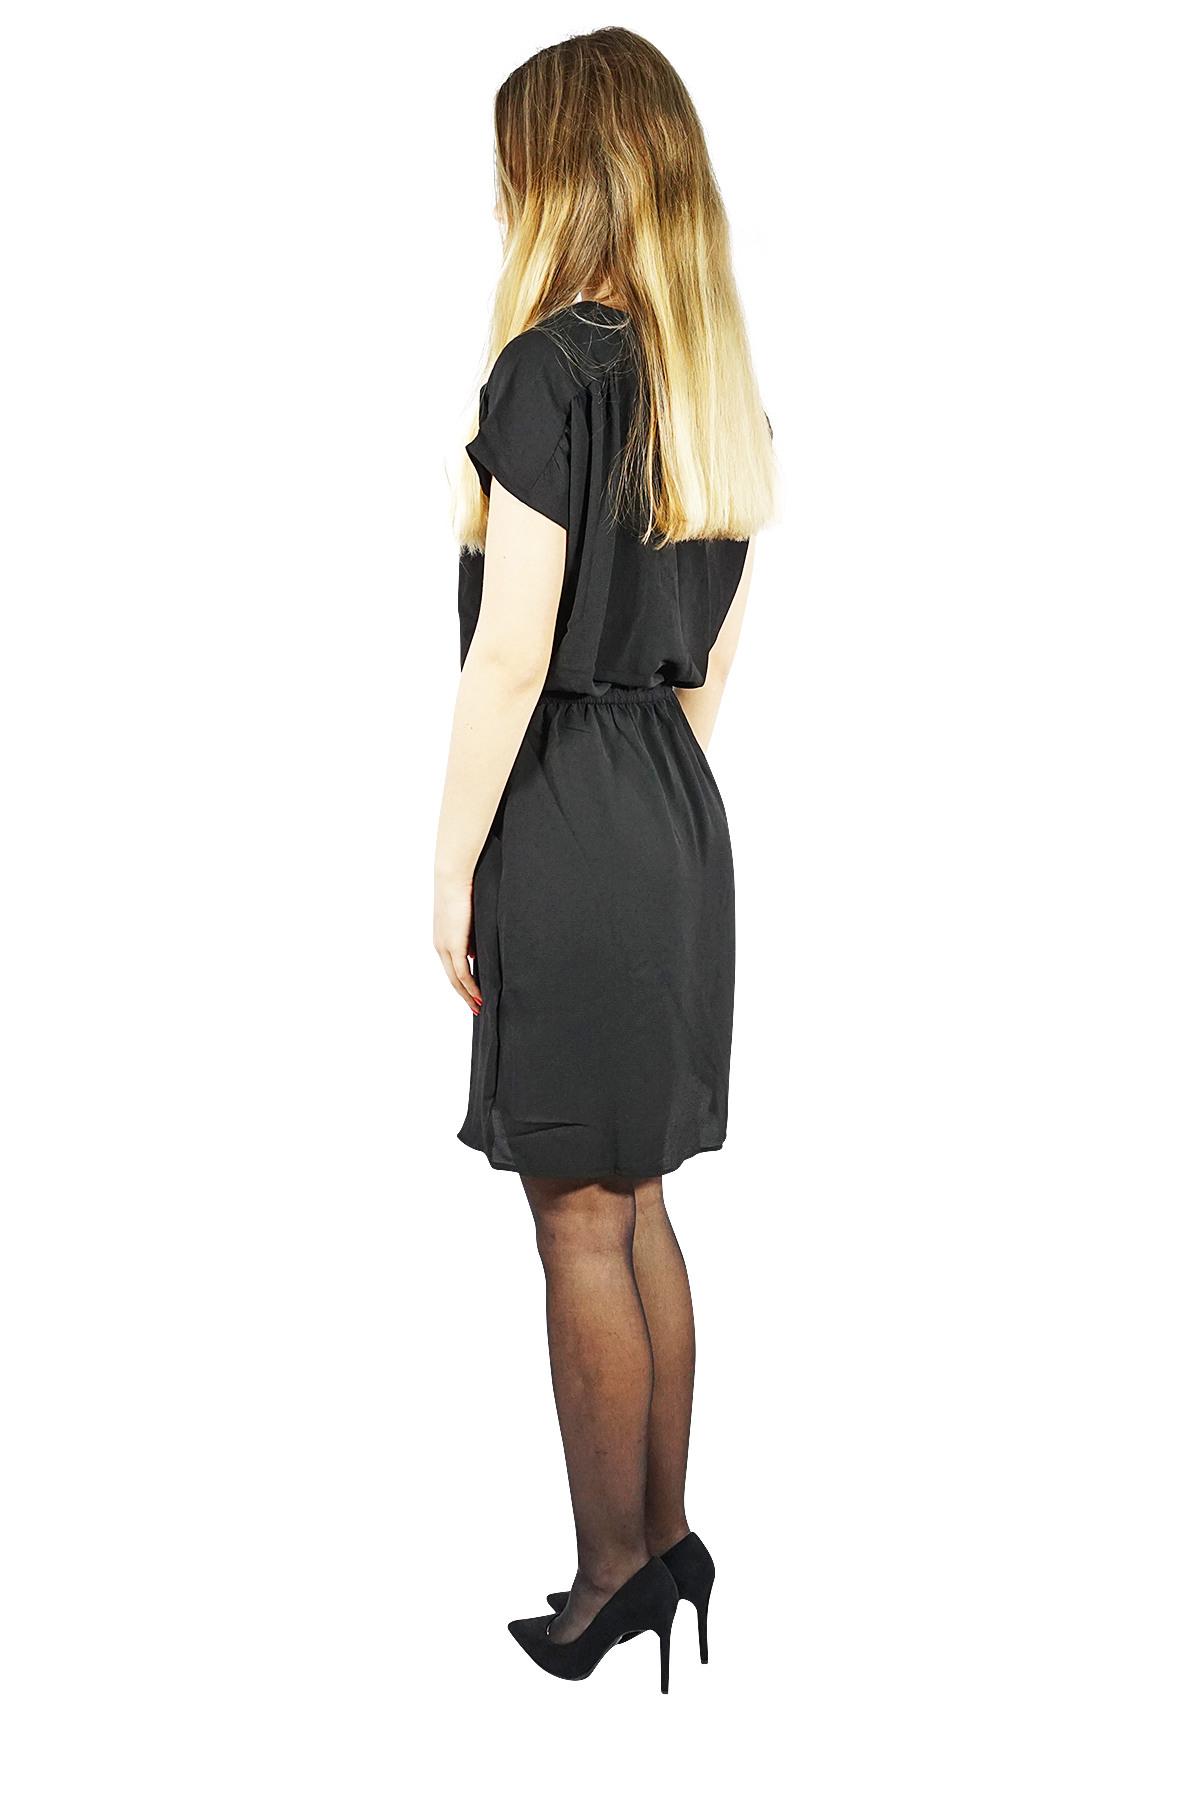 20 Perfekt Abendkleid Lang Xs Spezialgebiet13 Schön Abendkleid Lang Xs Design